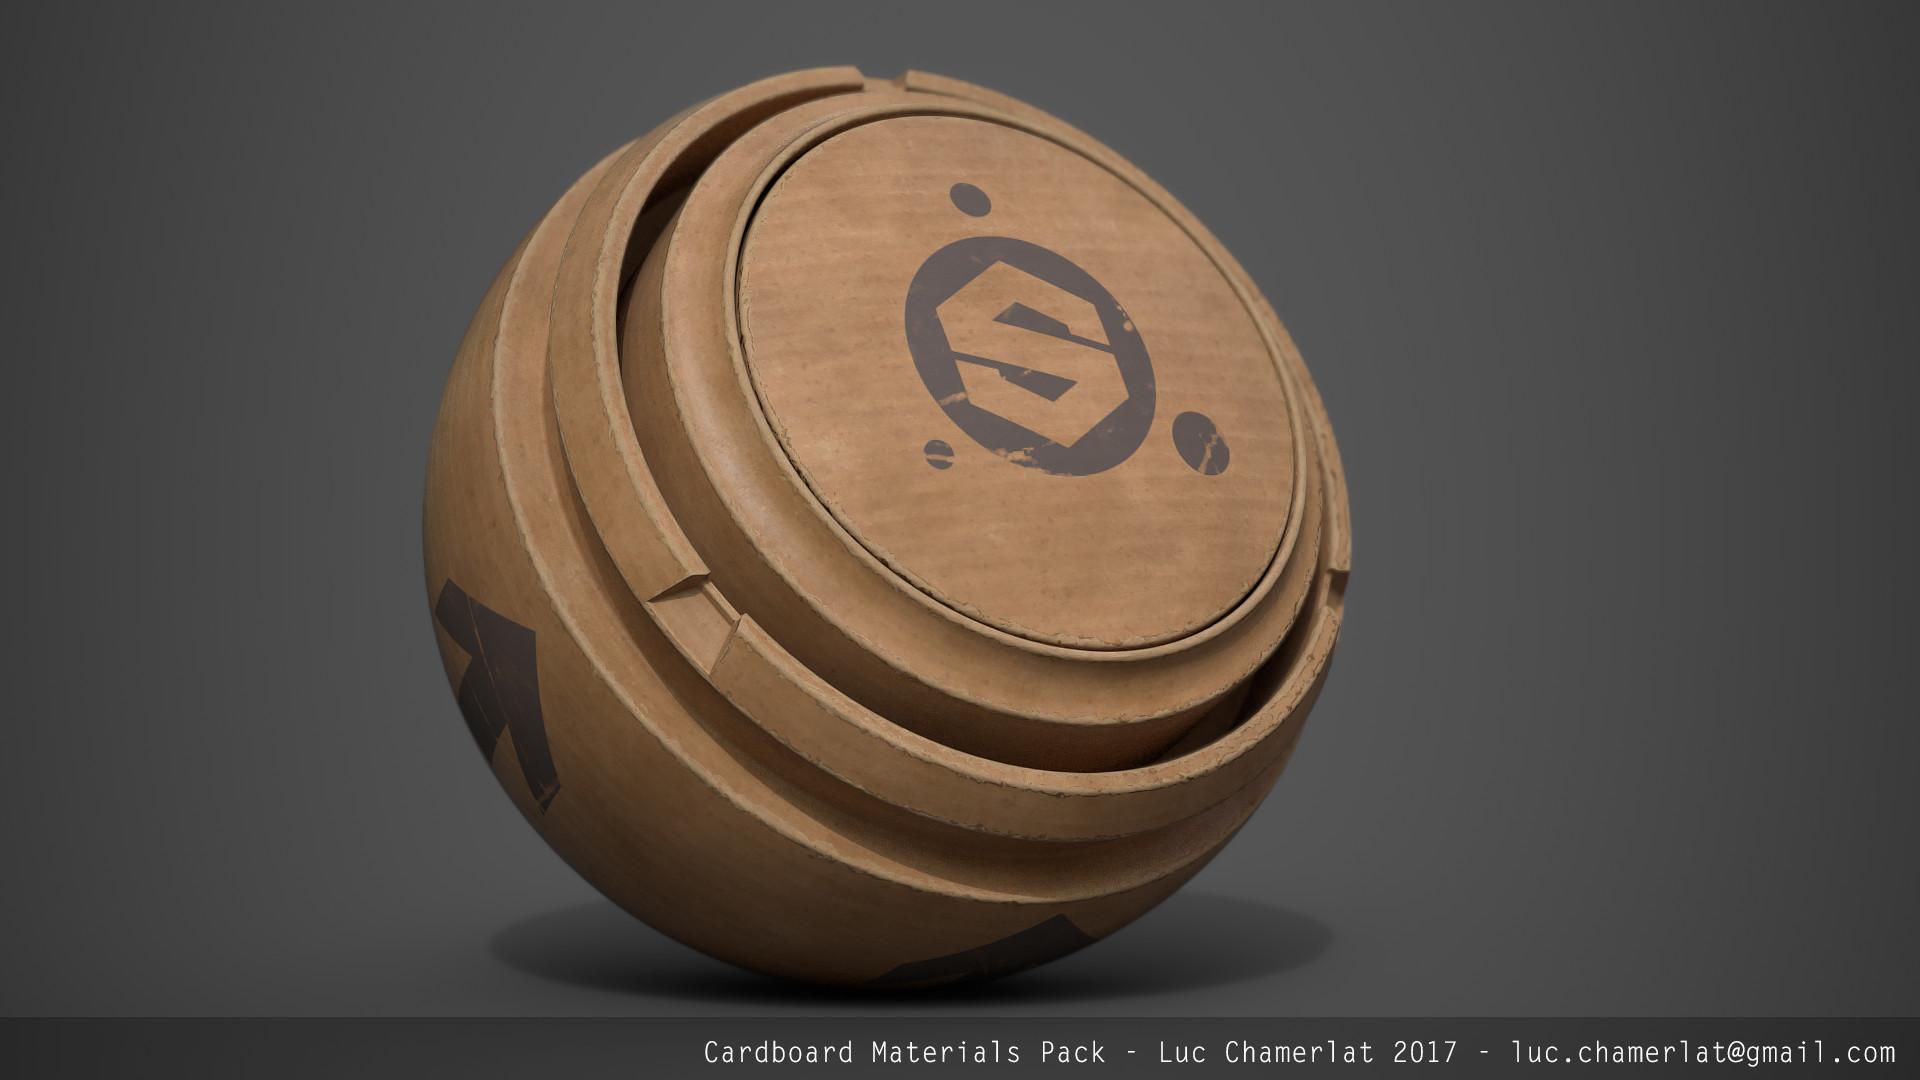 ArtStation - Gumroad free - Cardboard Materials Pack